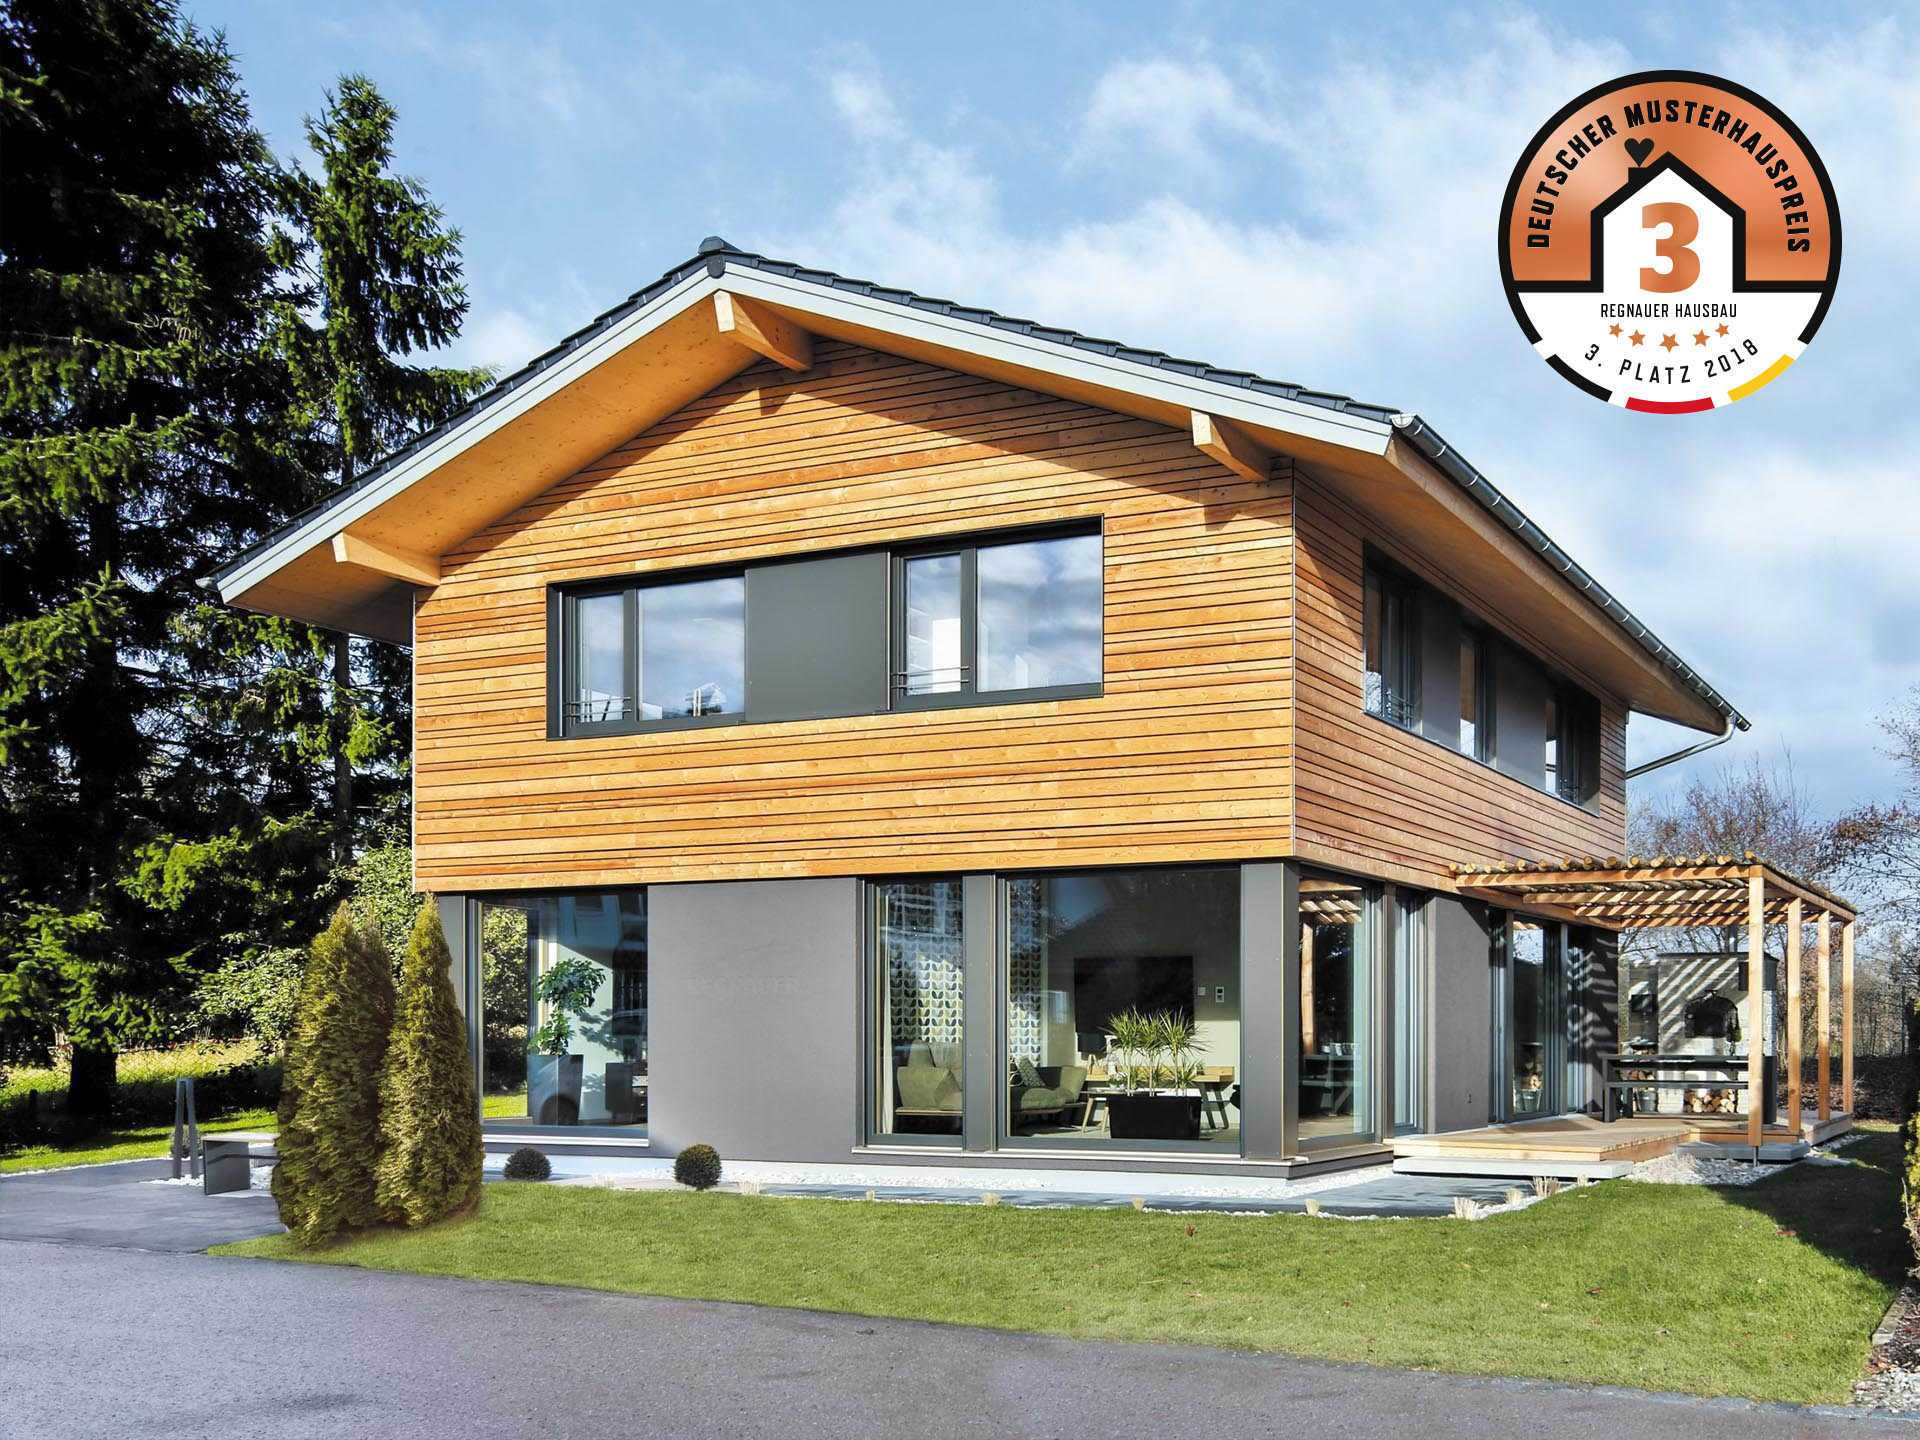 musterhaus heidi regnauer hausbau. Black Bedroom Furniture Sets. Home Design Ideas